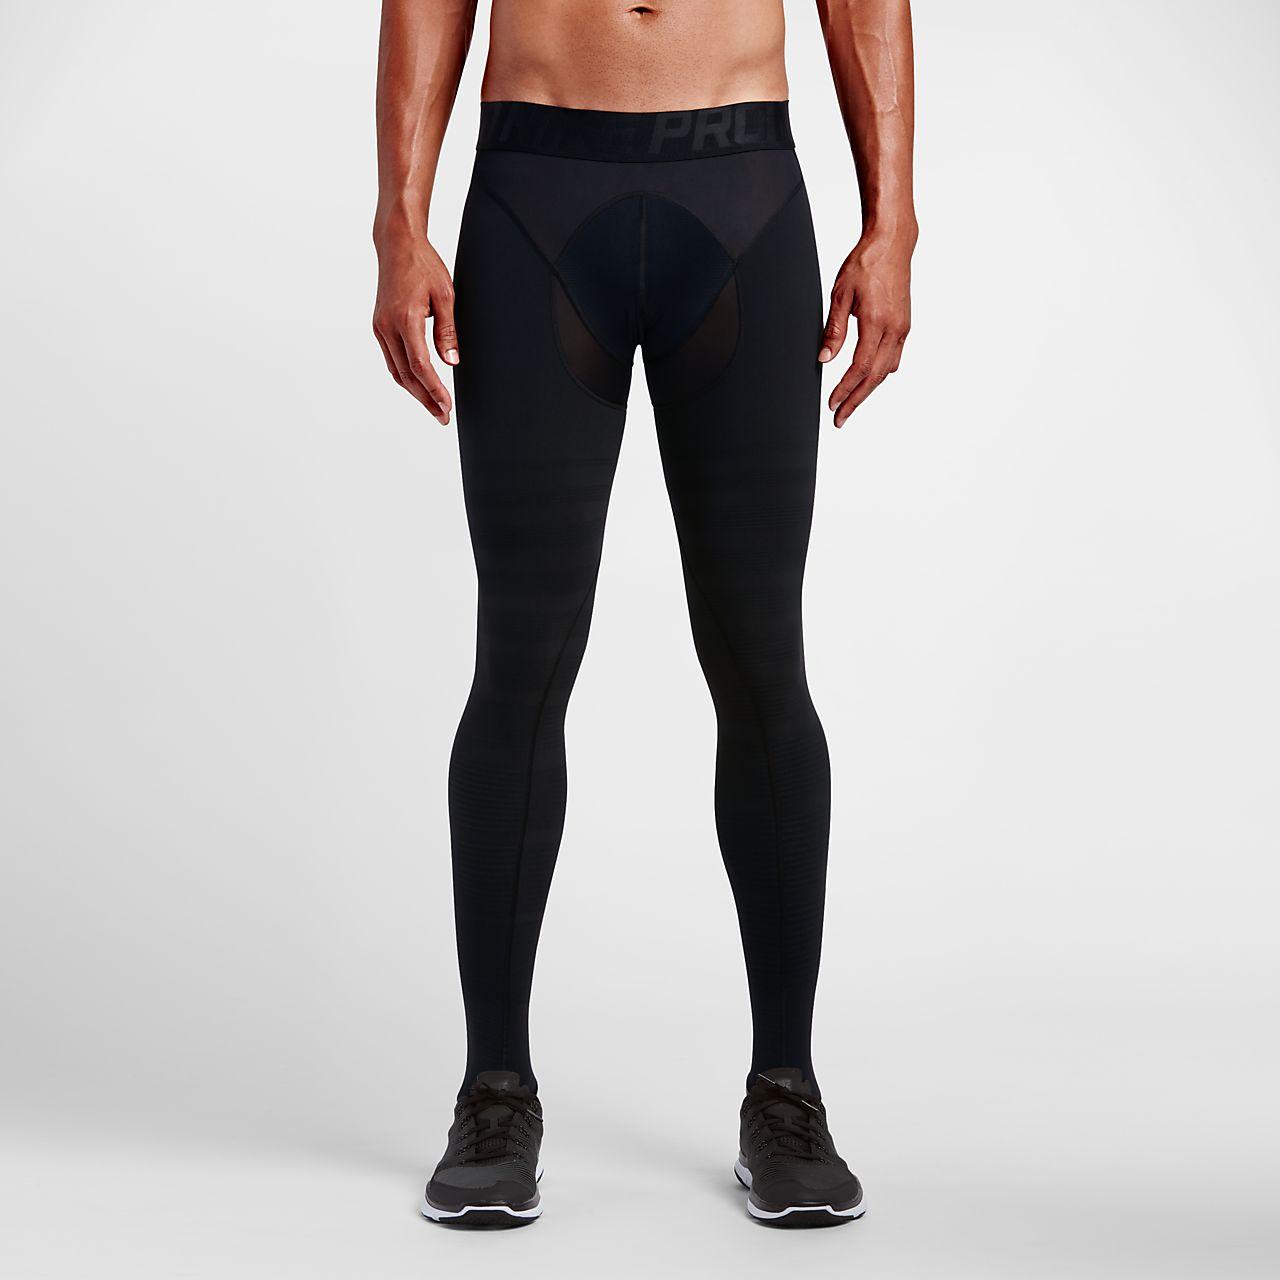 Nike Pro Hyperrecovery Men's Training Tights Black/Metallic Pewter